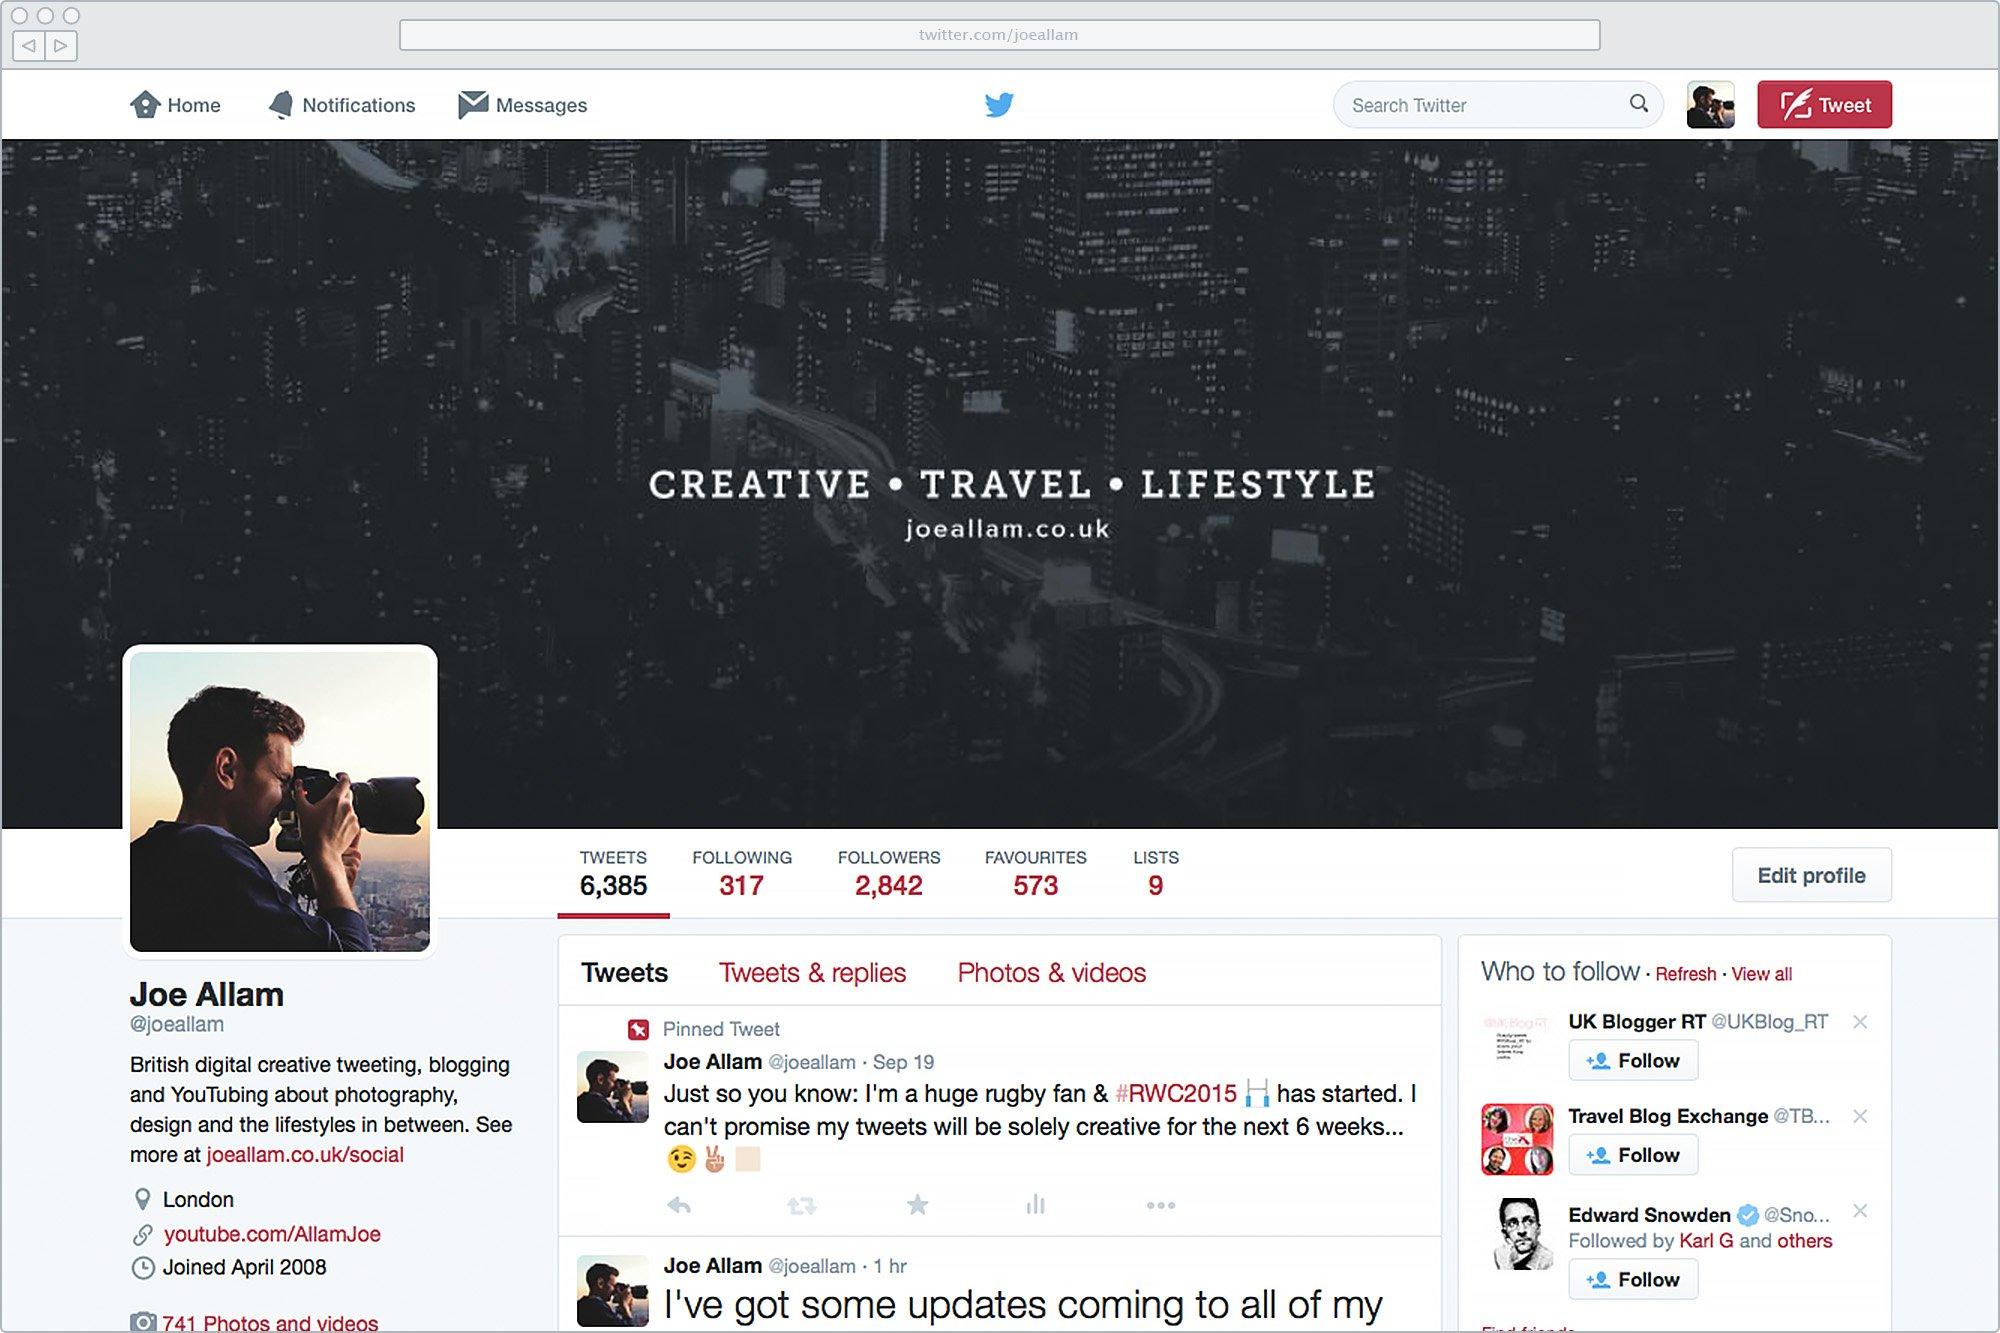 New Twitter Branding